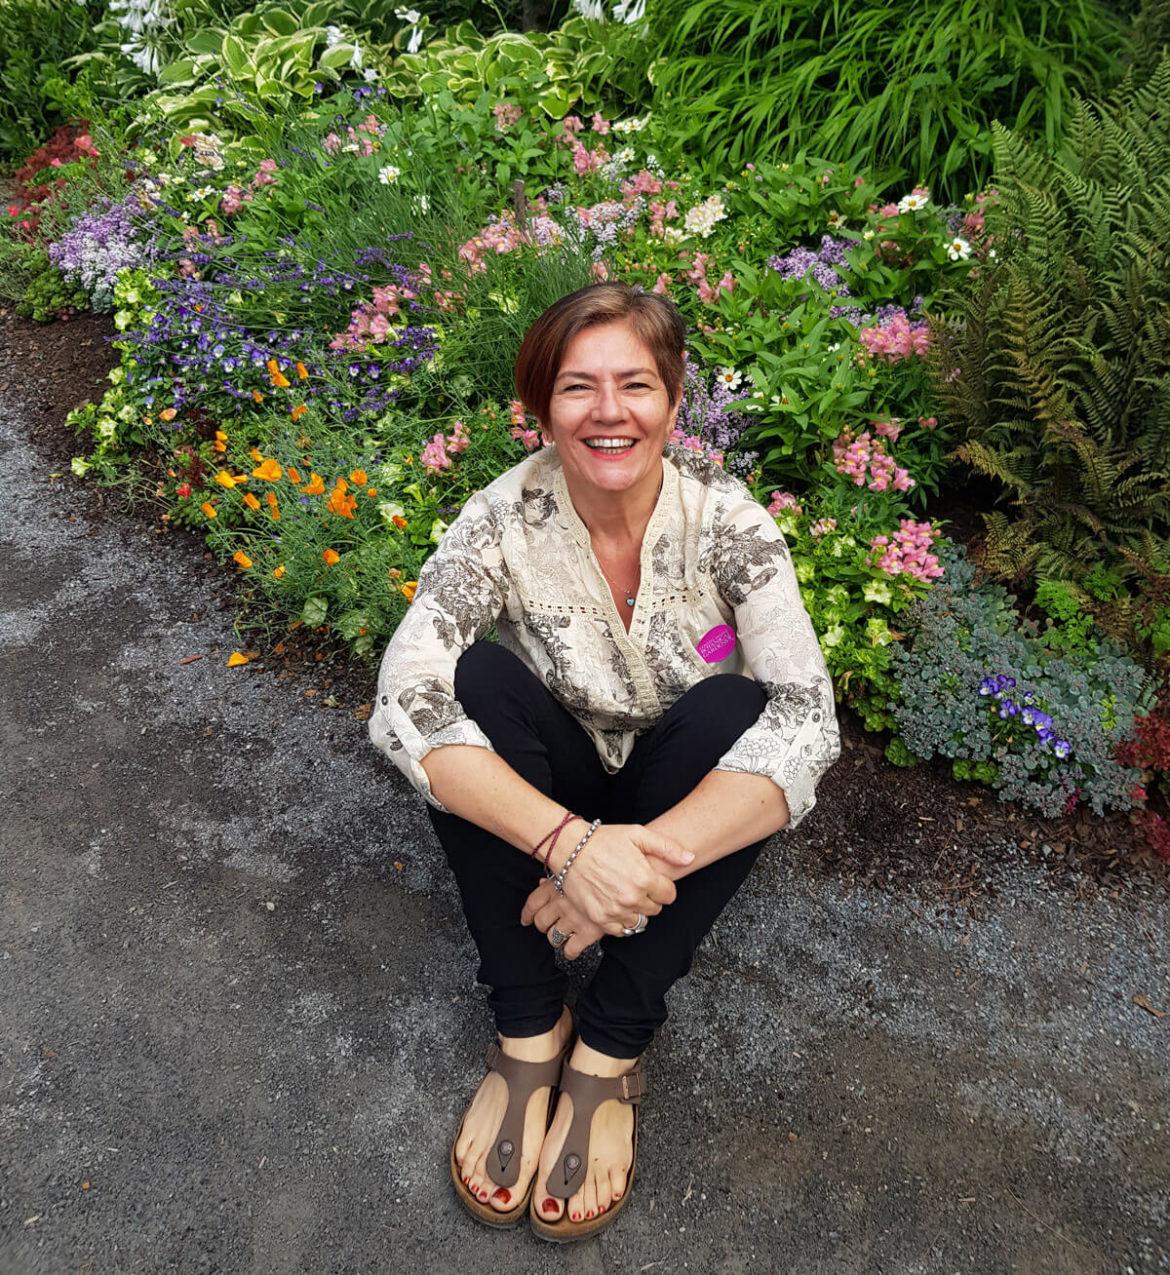 Our New Executive Director Maria Jose Cappa